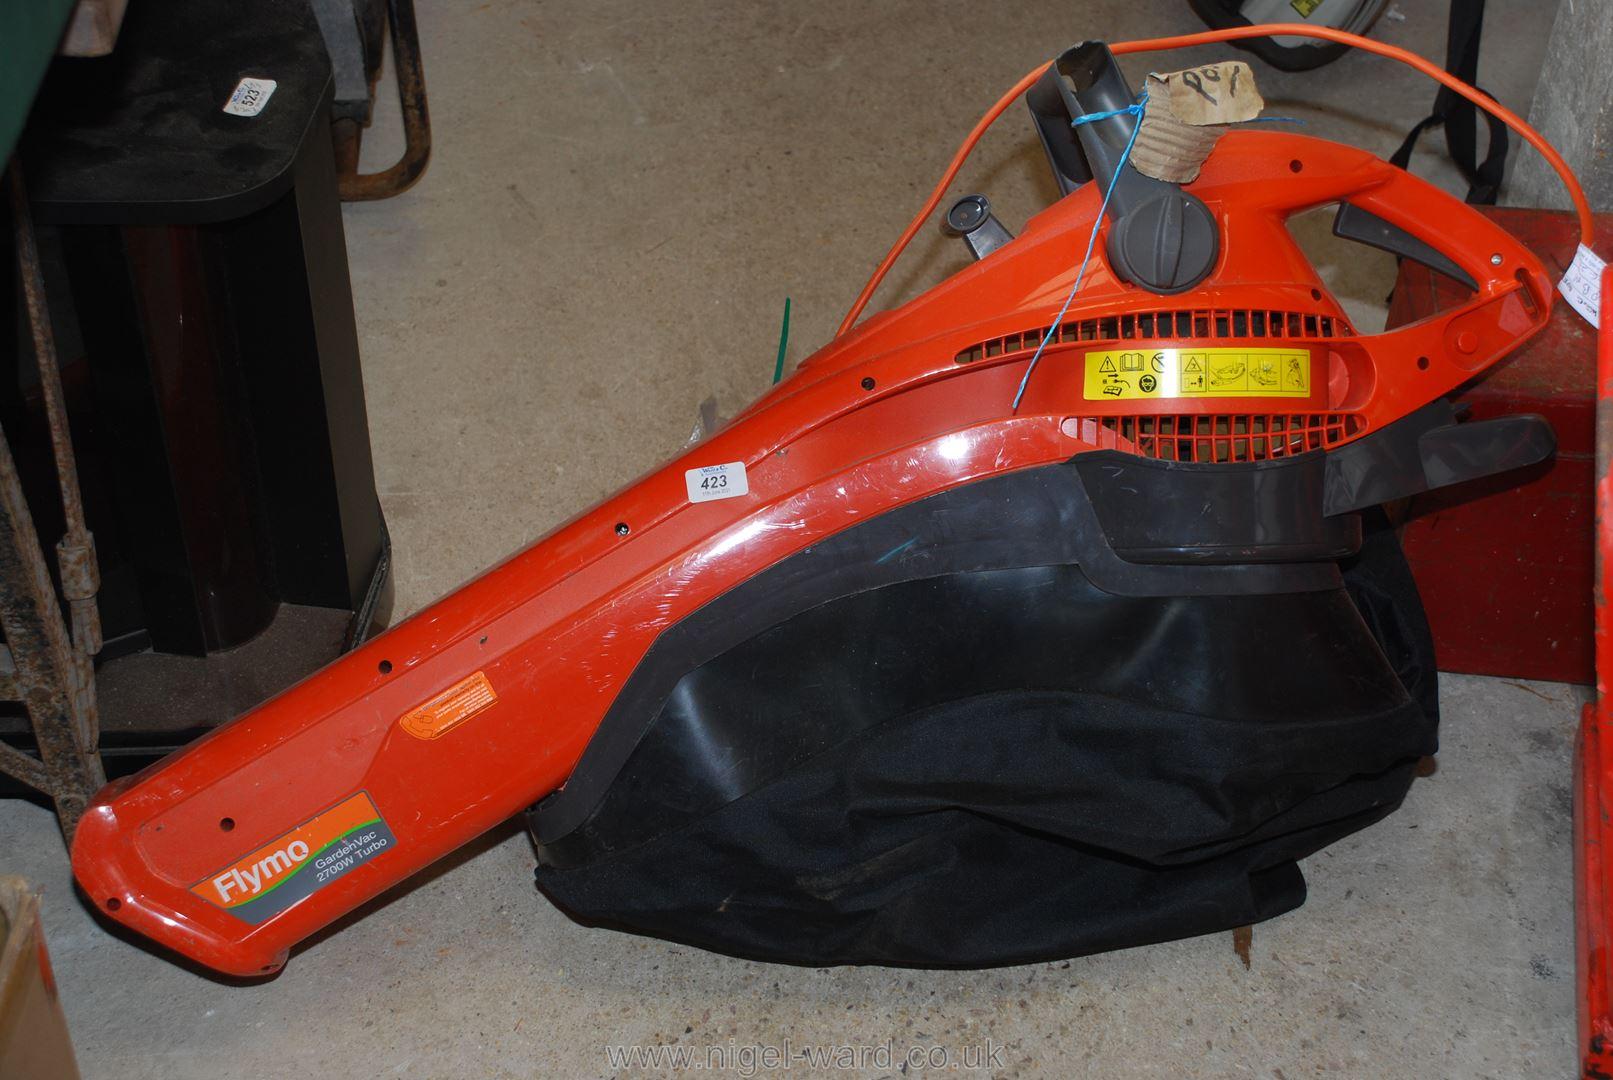 A Flymo garden vacuum/blower.